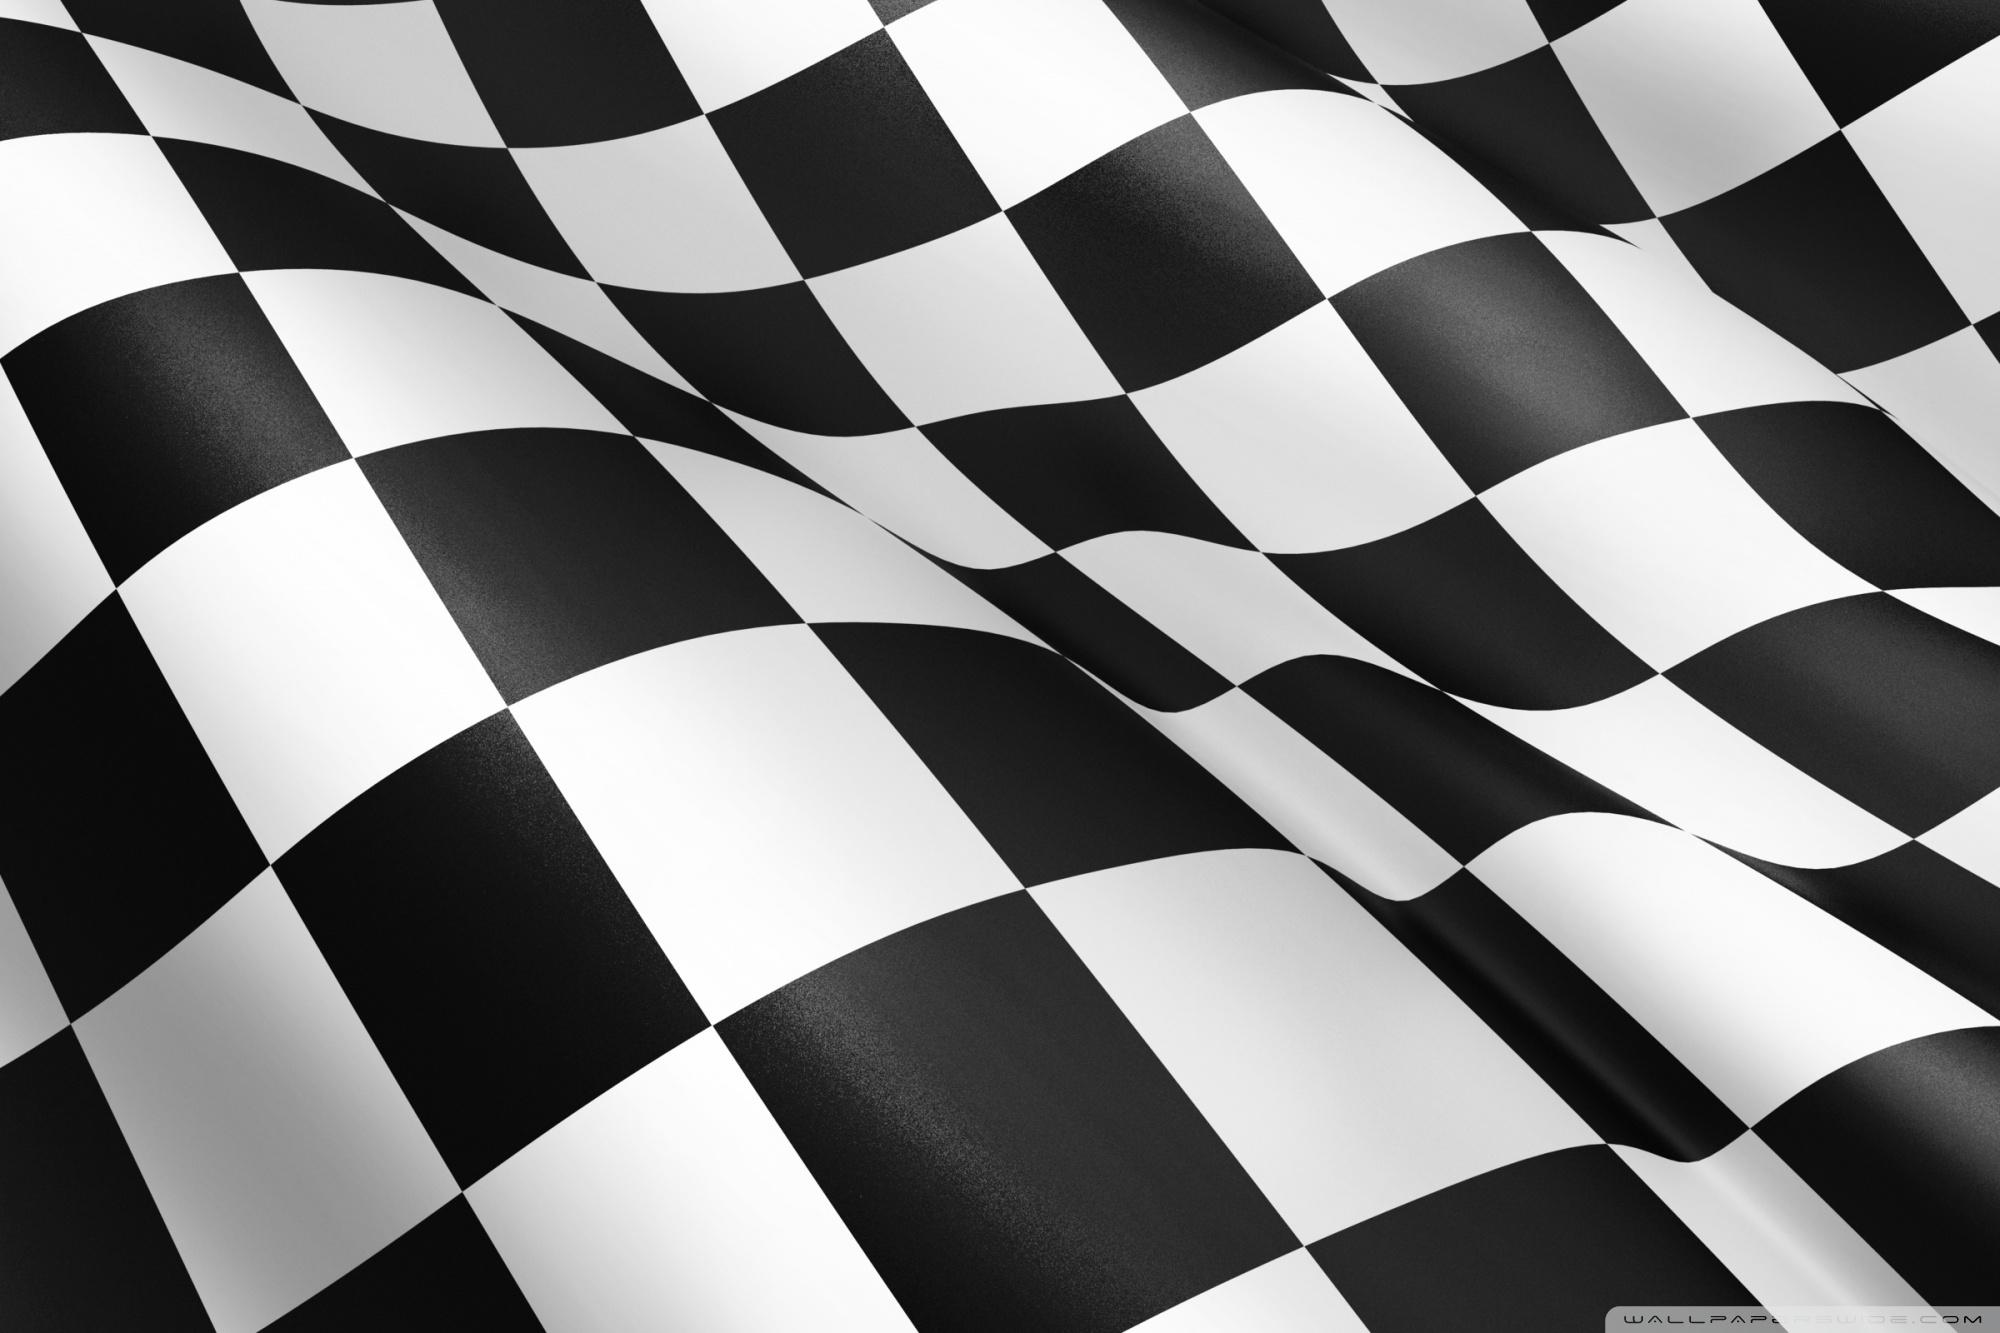 Racing Flag 4K HD Desktop Wallpaper for 4K Ultra HD TV Dual 2000x1333